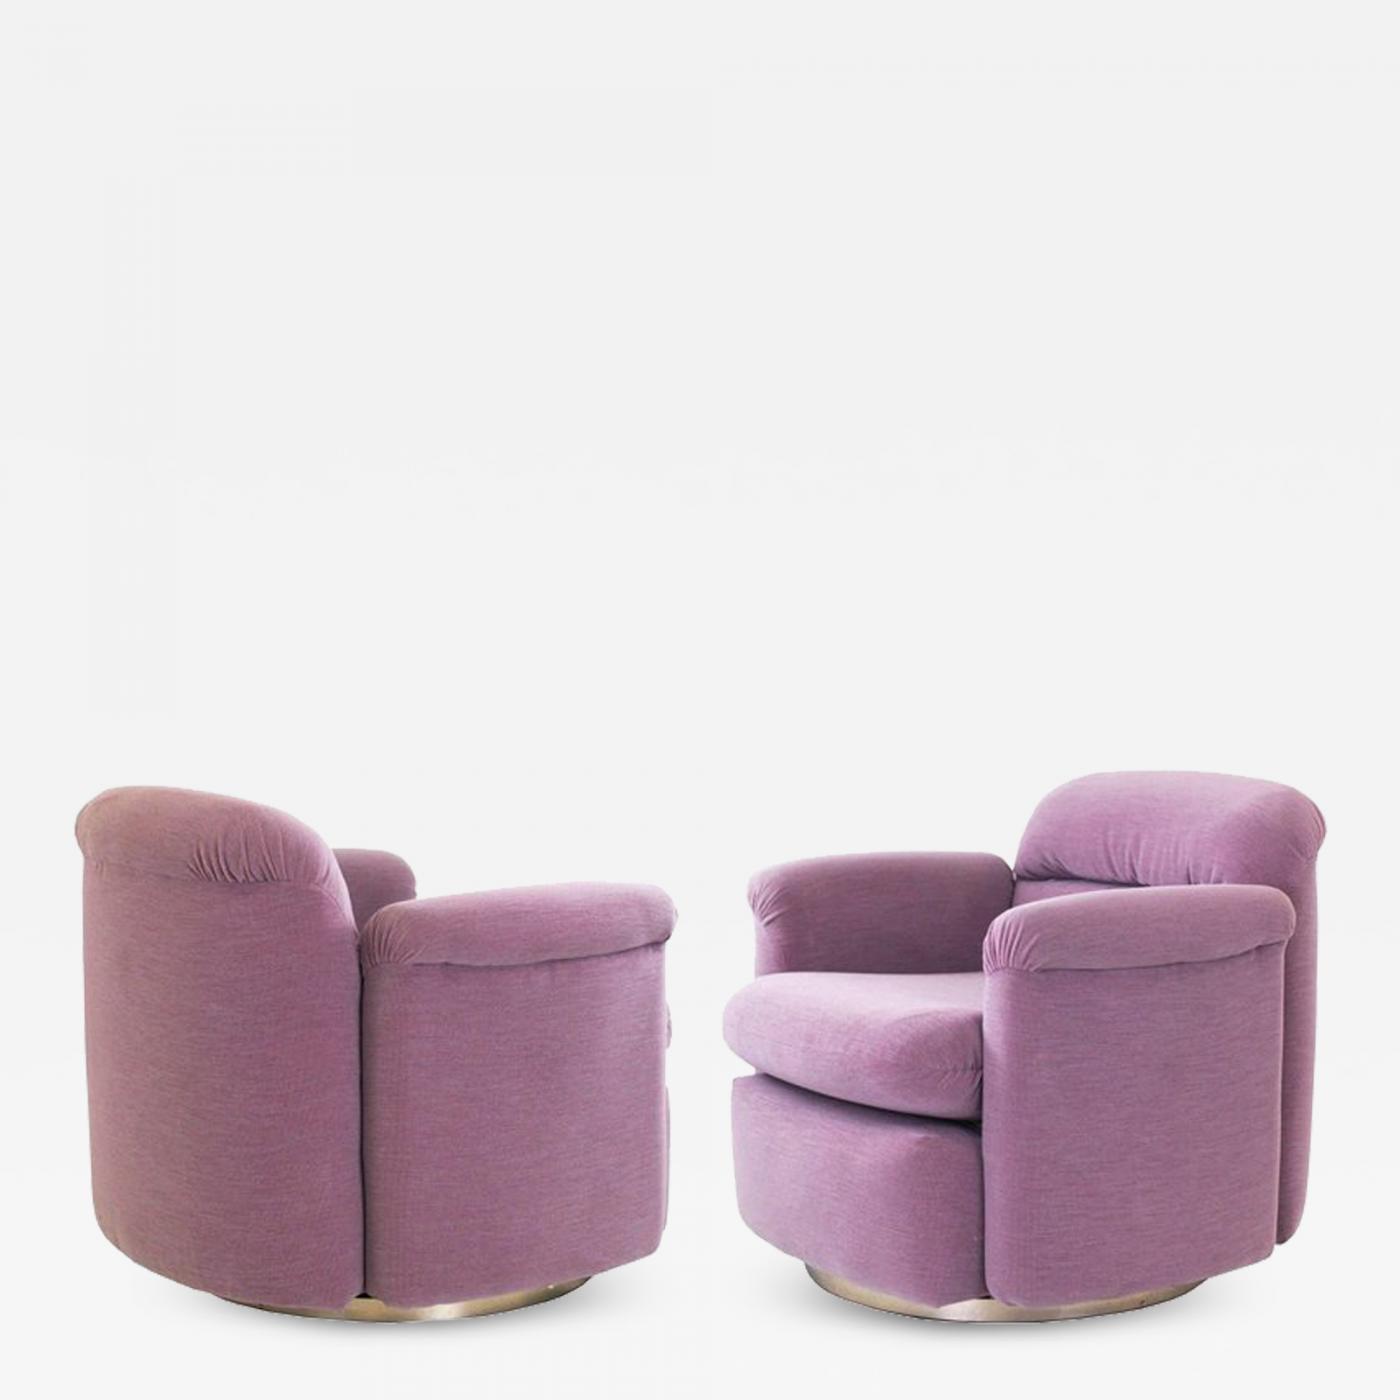 Listings / Furniture / Seating / Club Chairs · Milo Baughman Pair Of Mauve Milo  Baughman Swivel Chairs